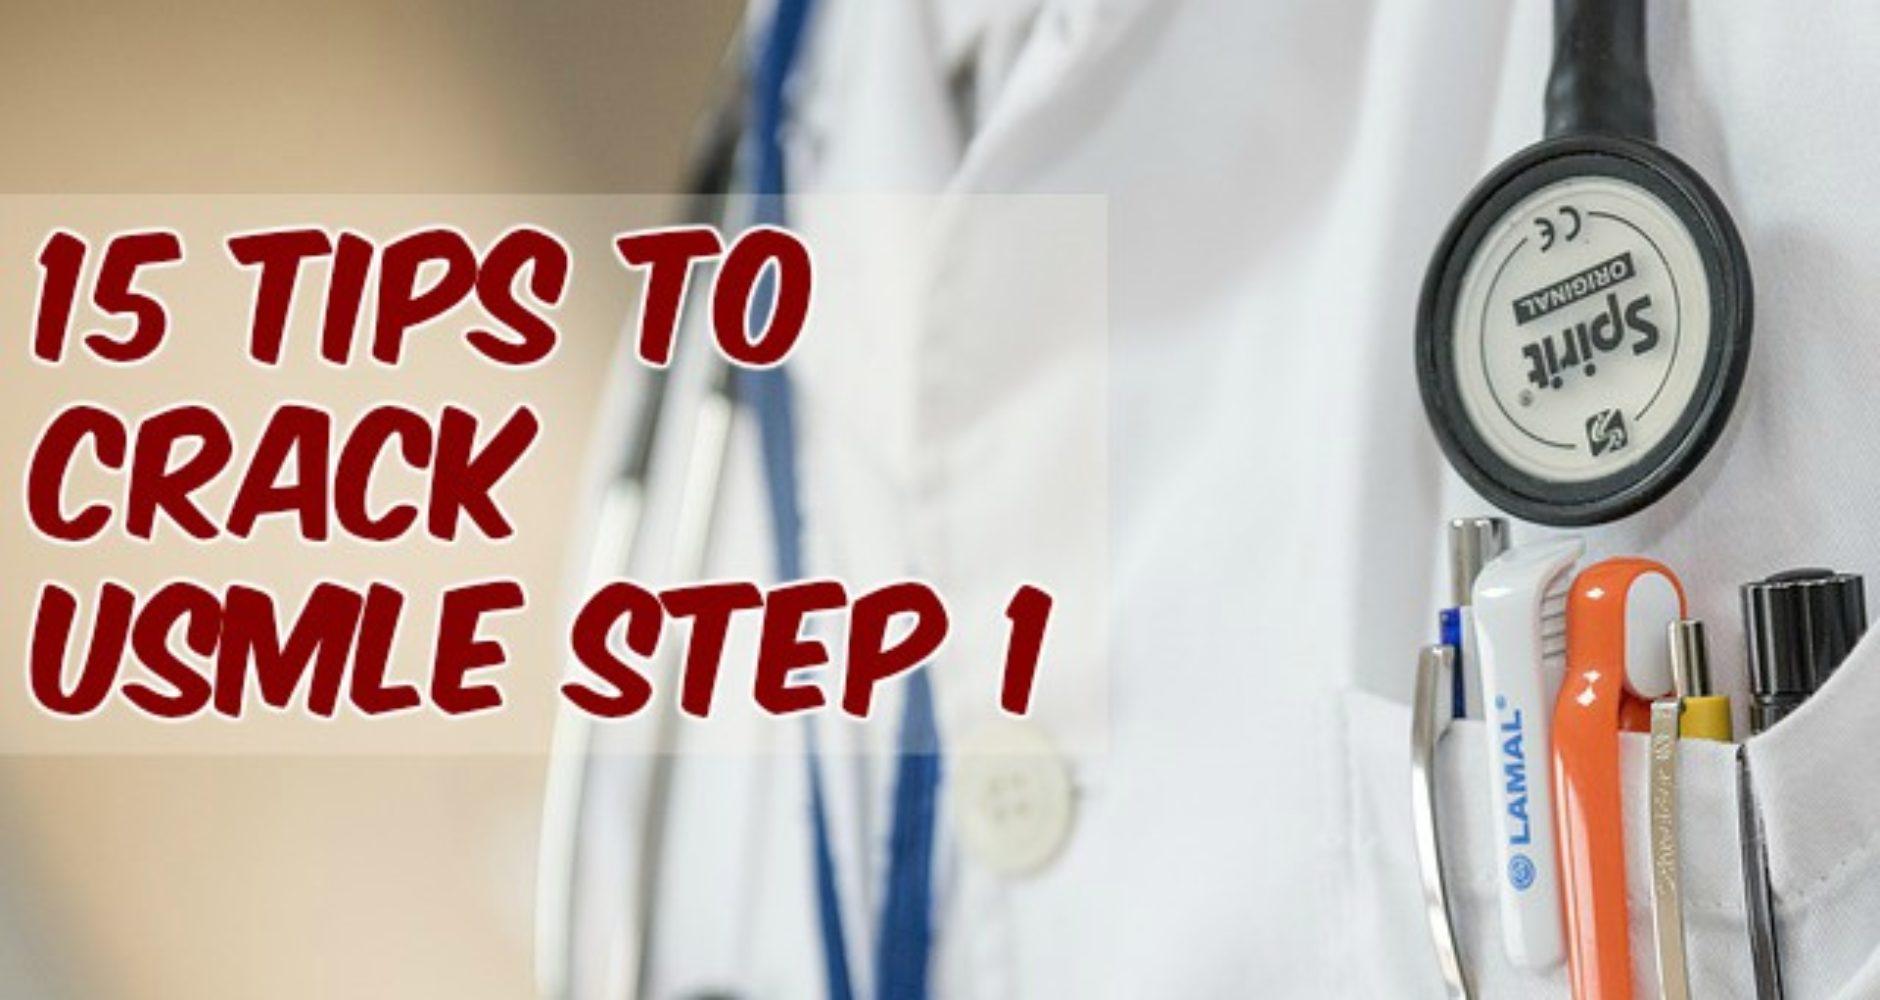 Top 15 Tips To Crack USMLE Step 1 - PrepEZ